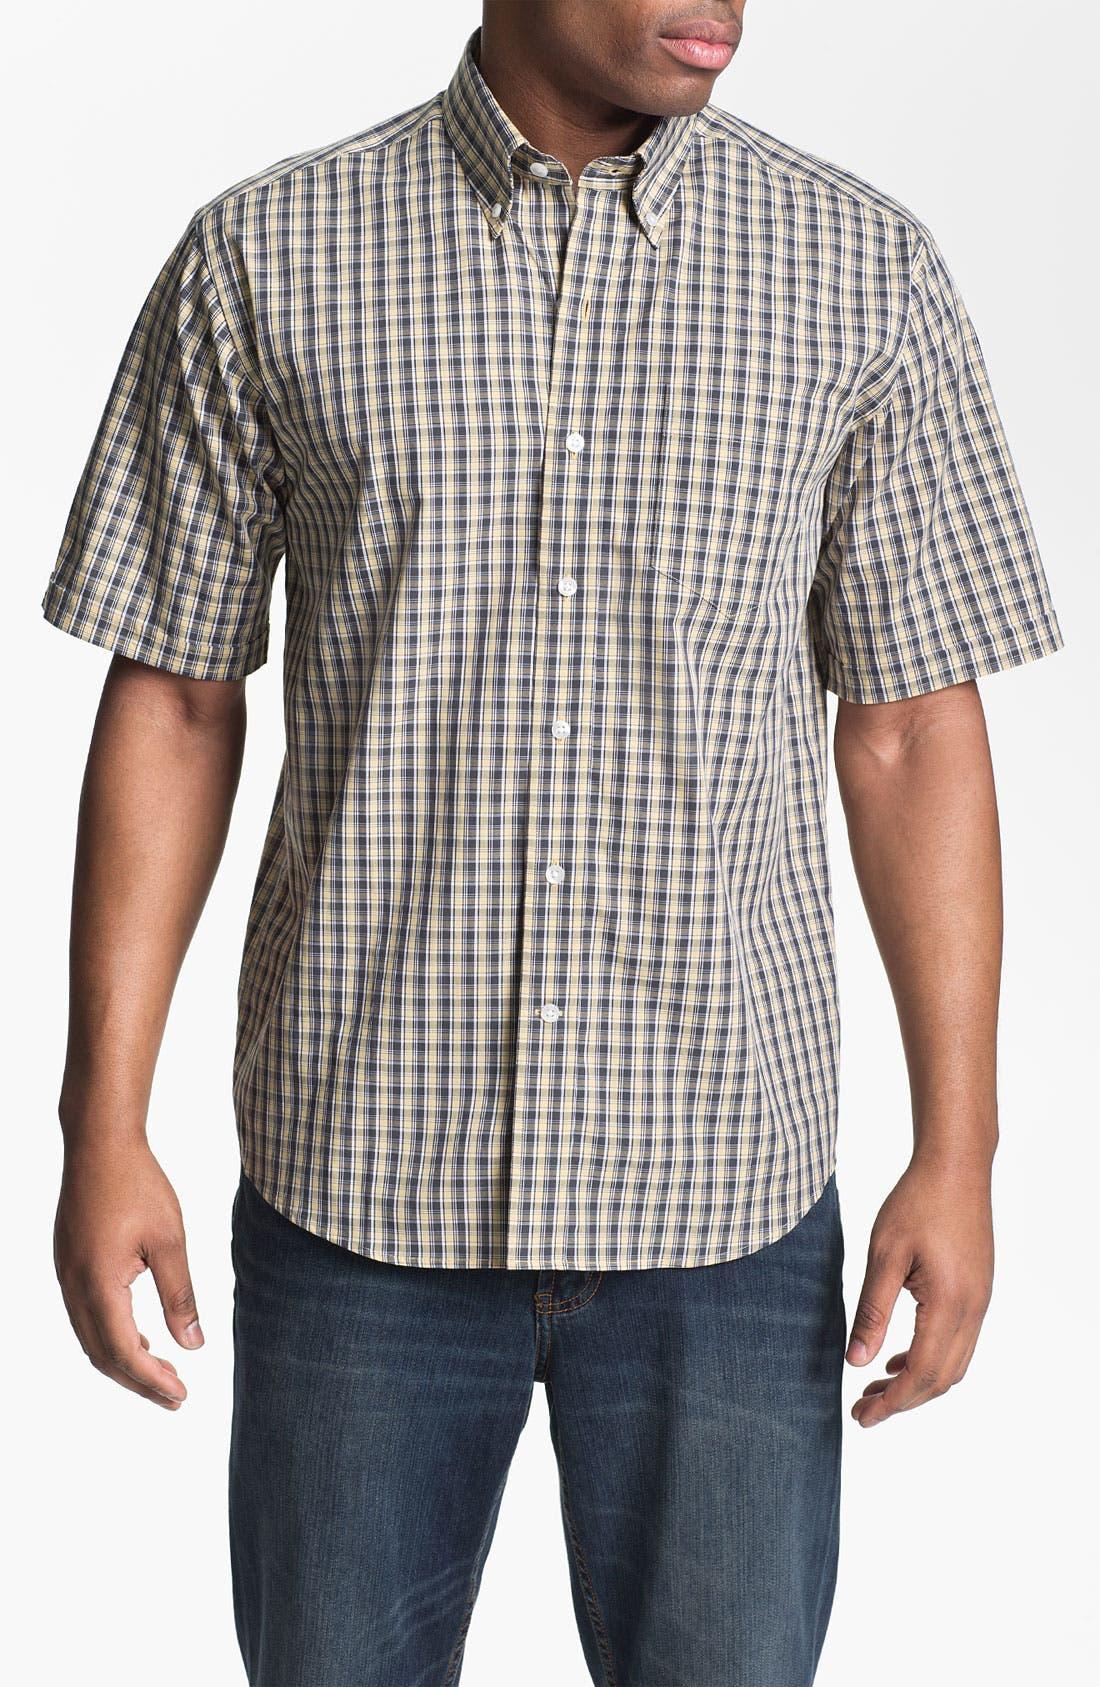 Alternate Image 1 Selected - Cutter & Buck 'Midvale' Check Sport Shirt (Big & Tall)